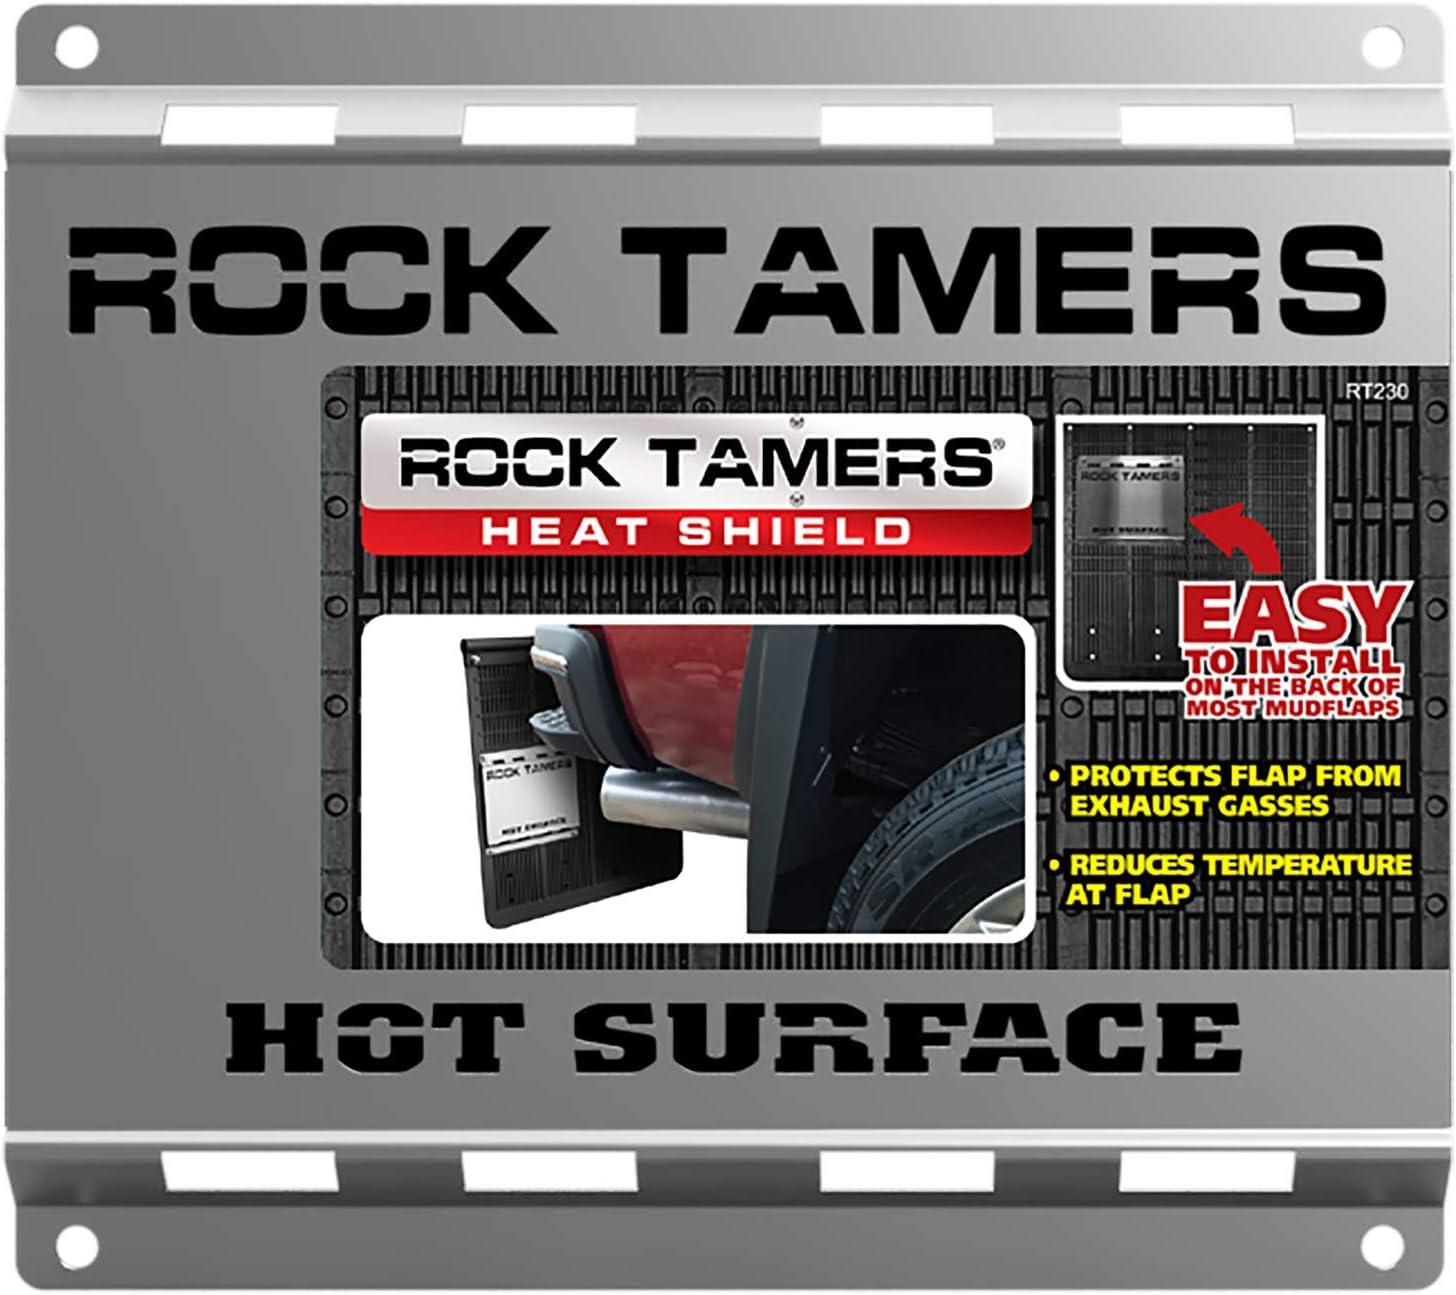 Rock Tamers, Llc RT230 Rock Tamer Heat Shield